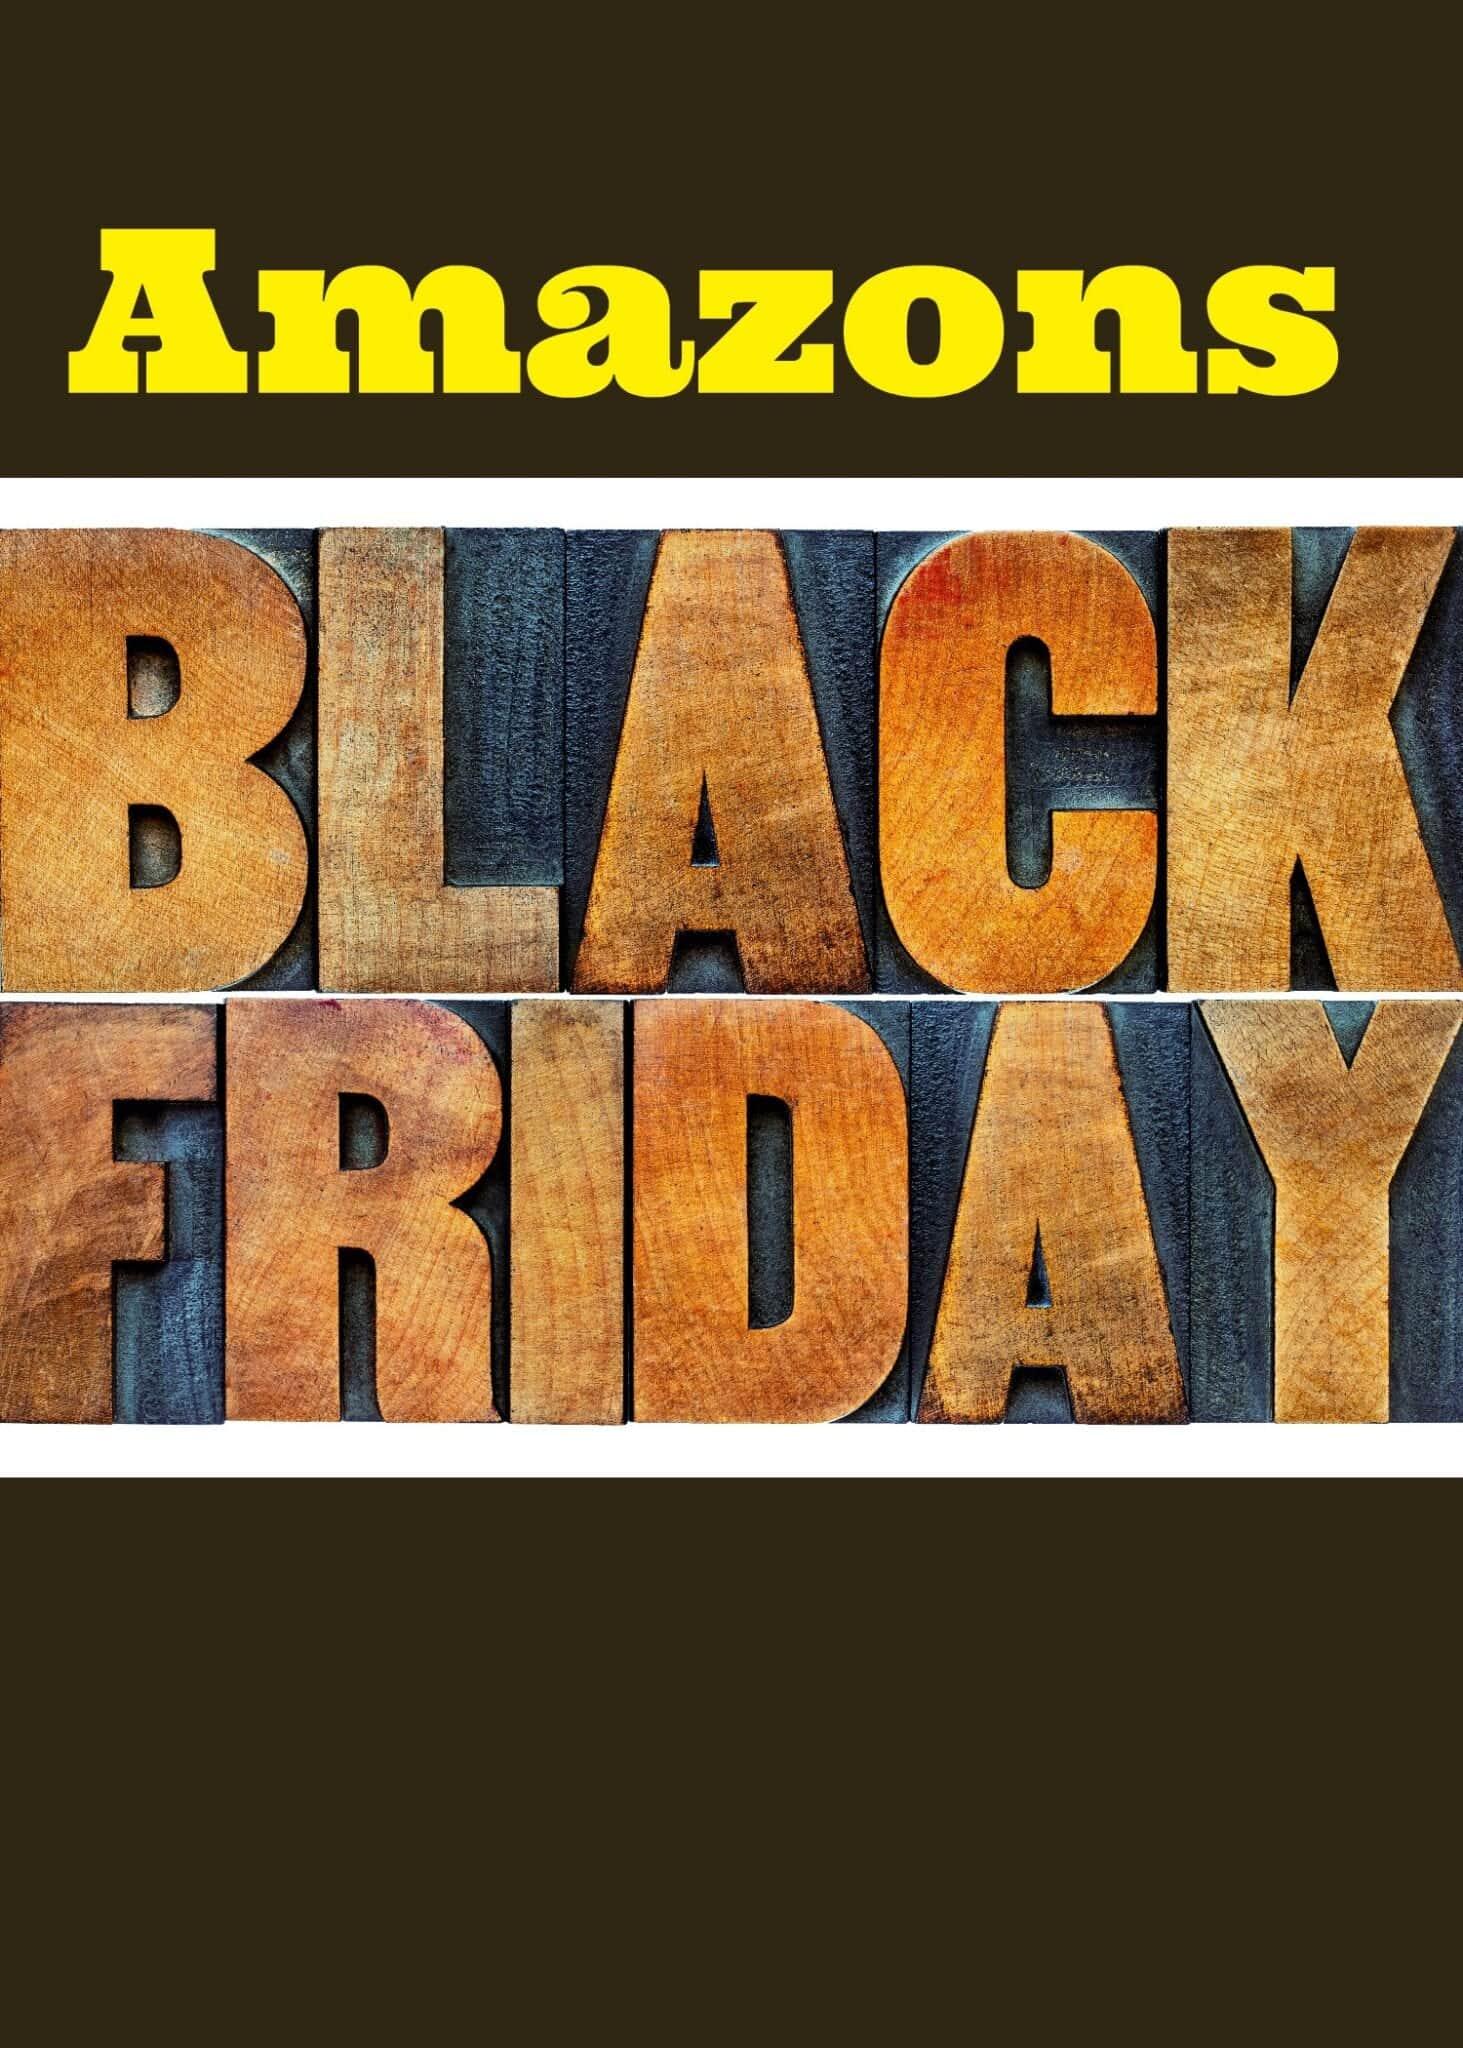 amazoins-black-friday-deals